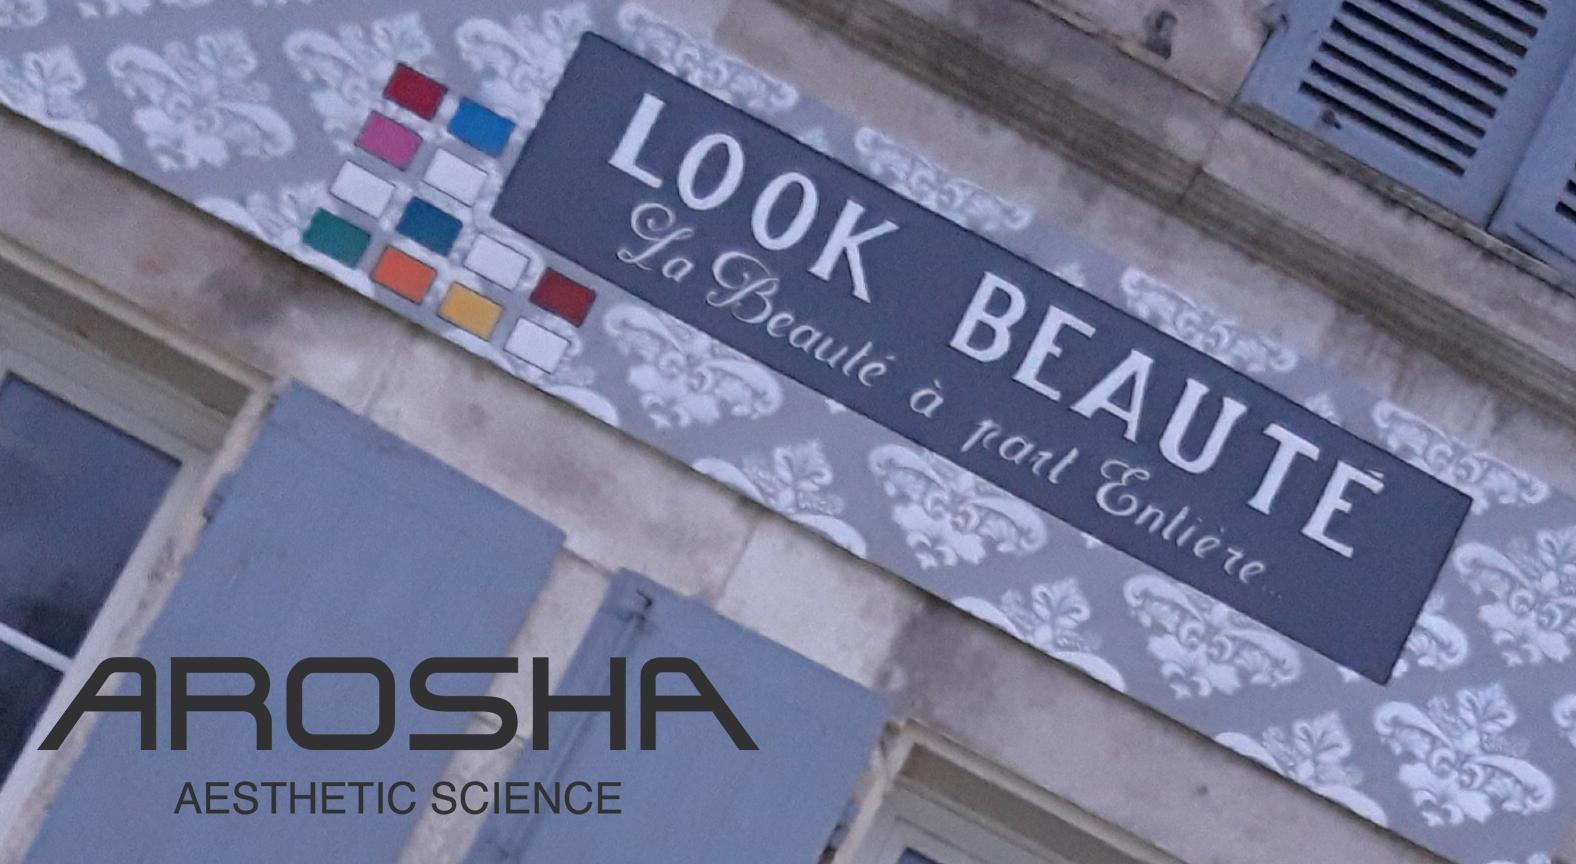 Institut de beauté à Niort